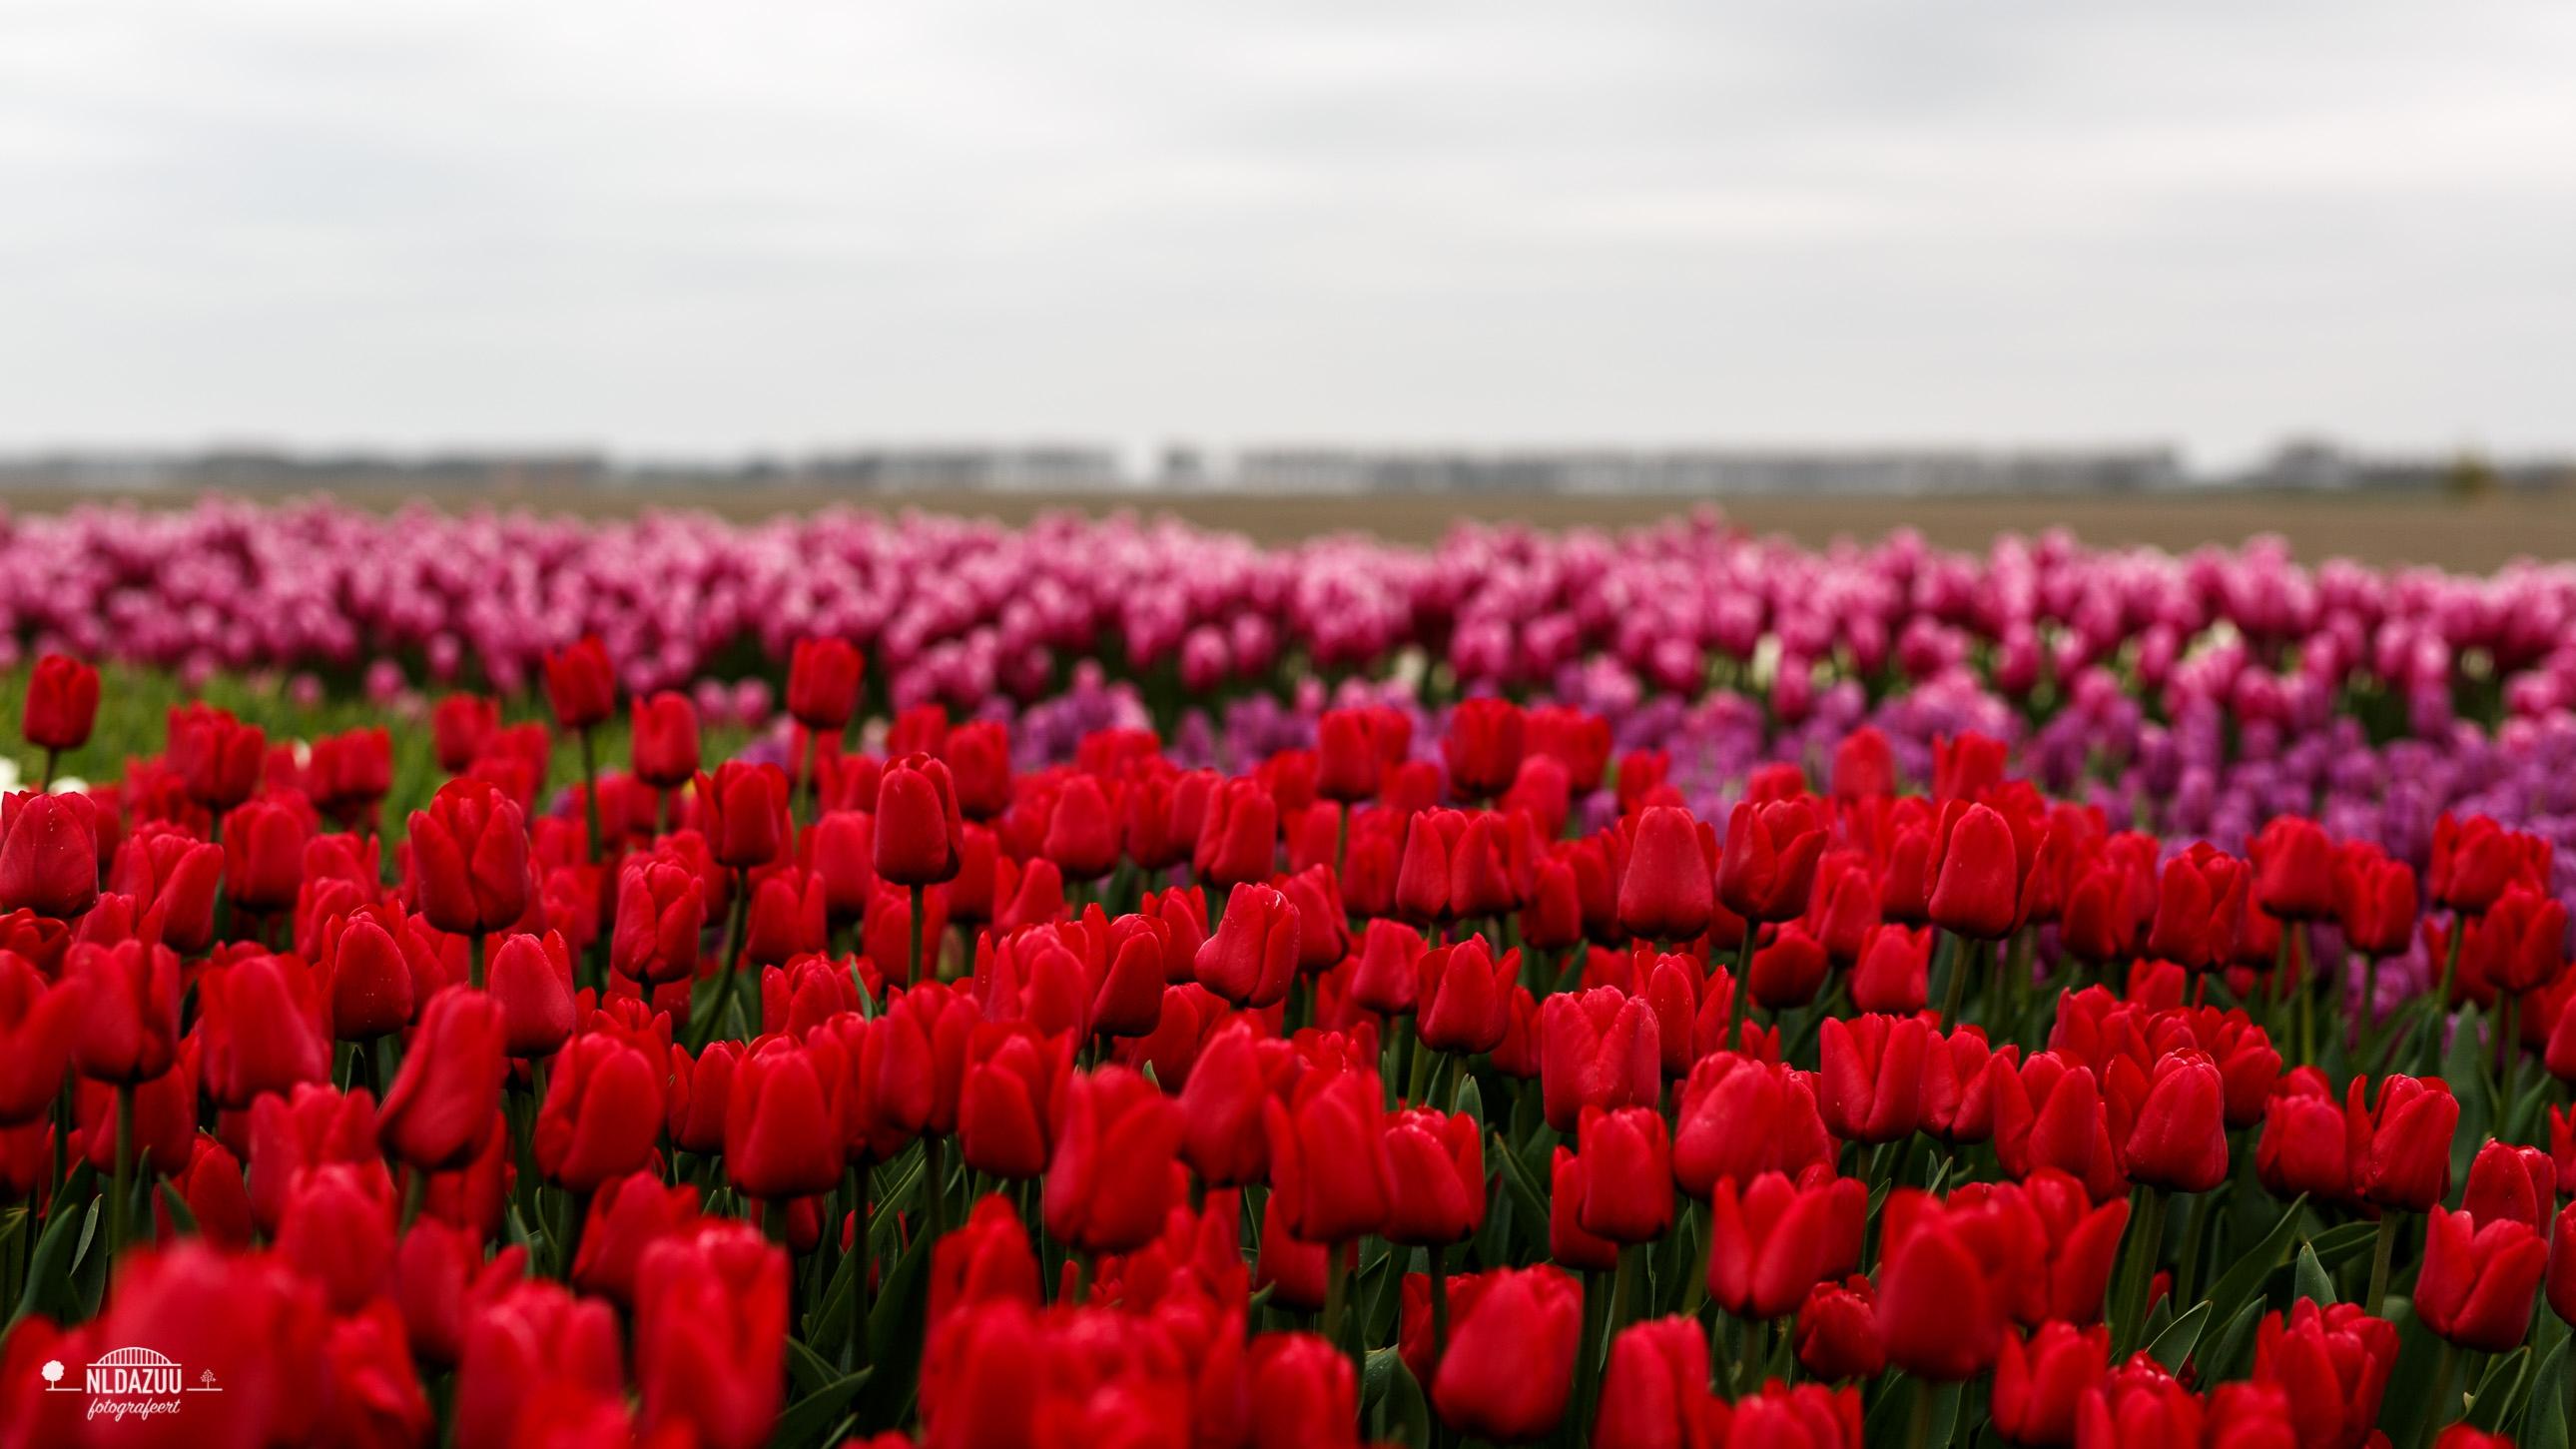 nldazuu 50 mm. challenge Tulpenfestival